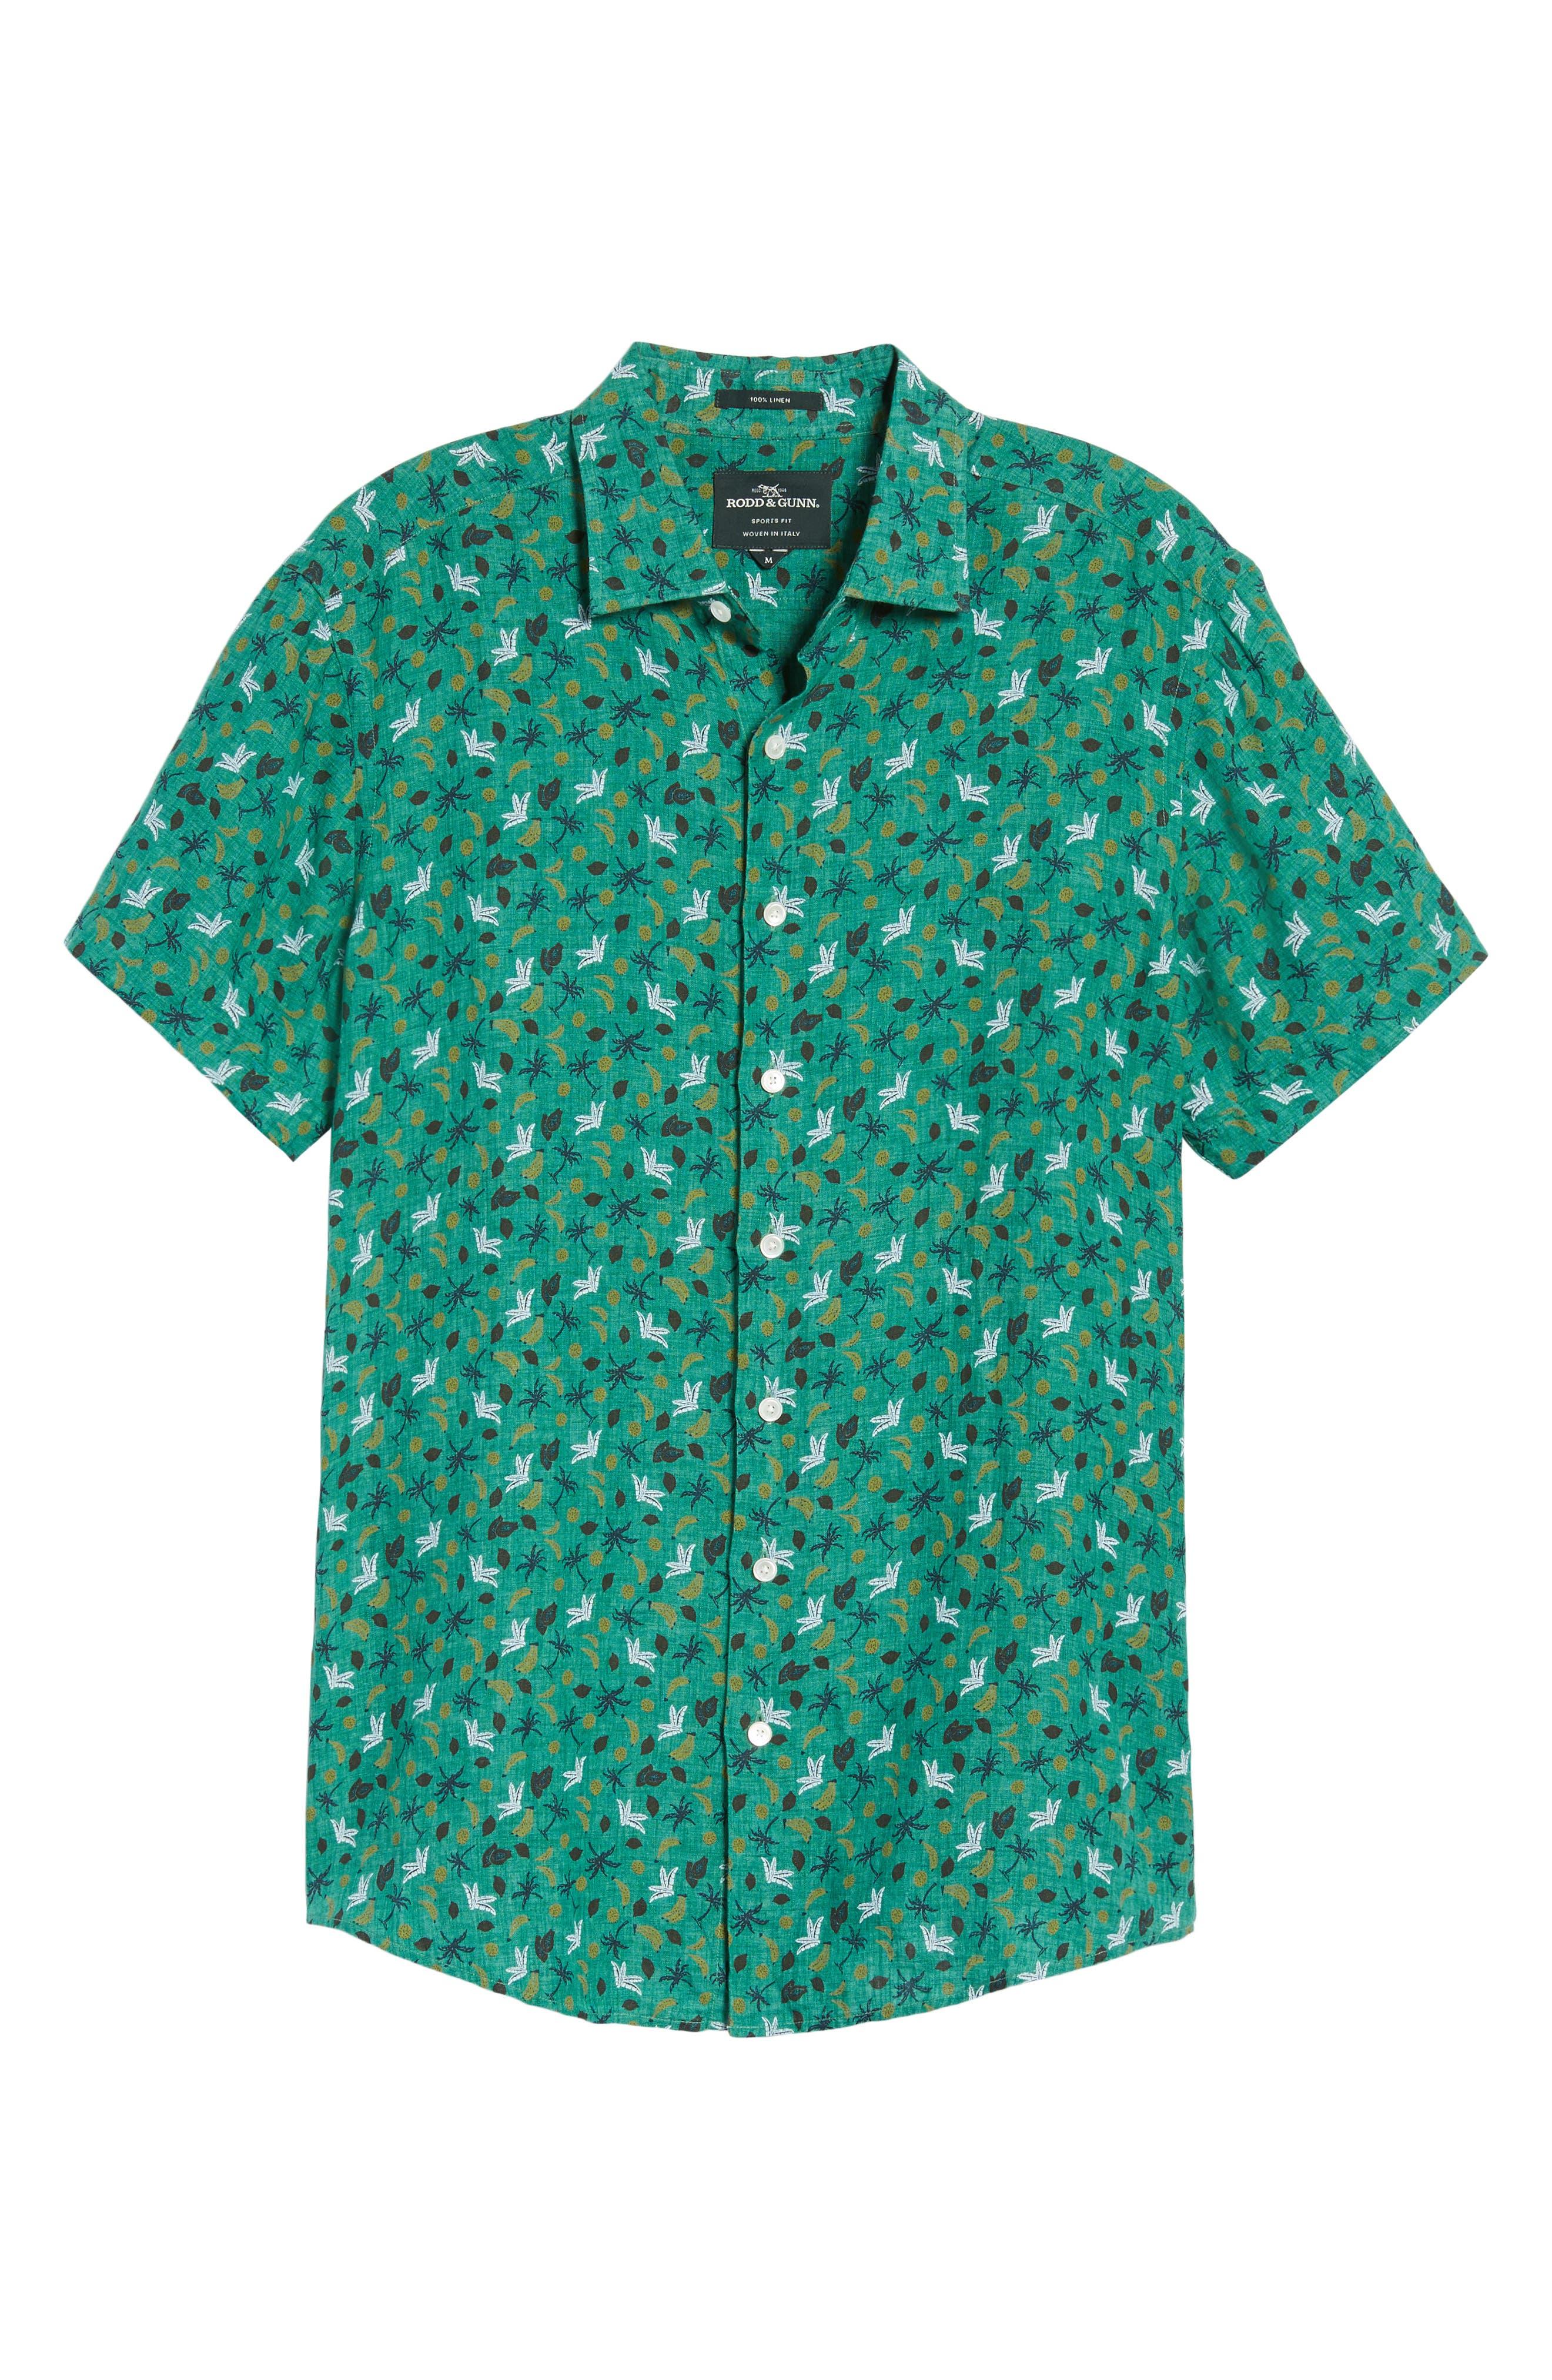 Canoe Creek Tropical Print Linen Sport Shirt,                             Alternate thumbnail 6, color,                             321